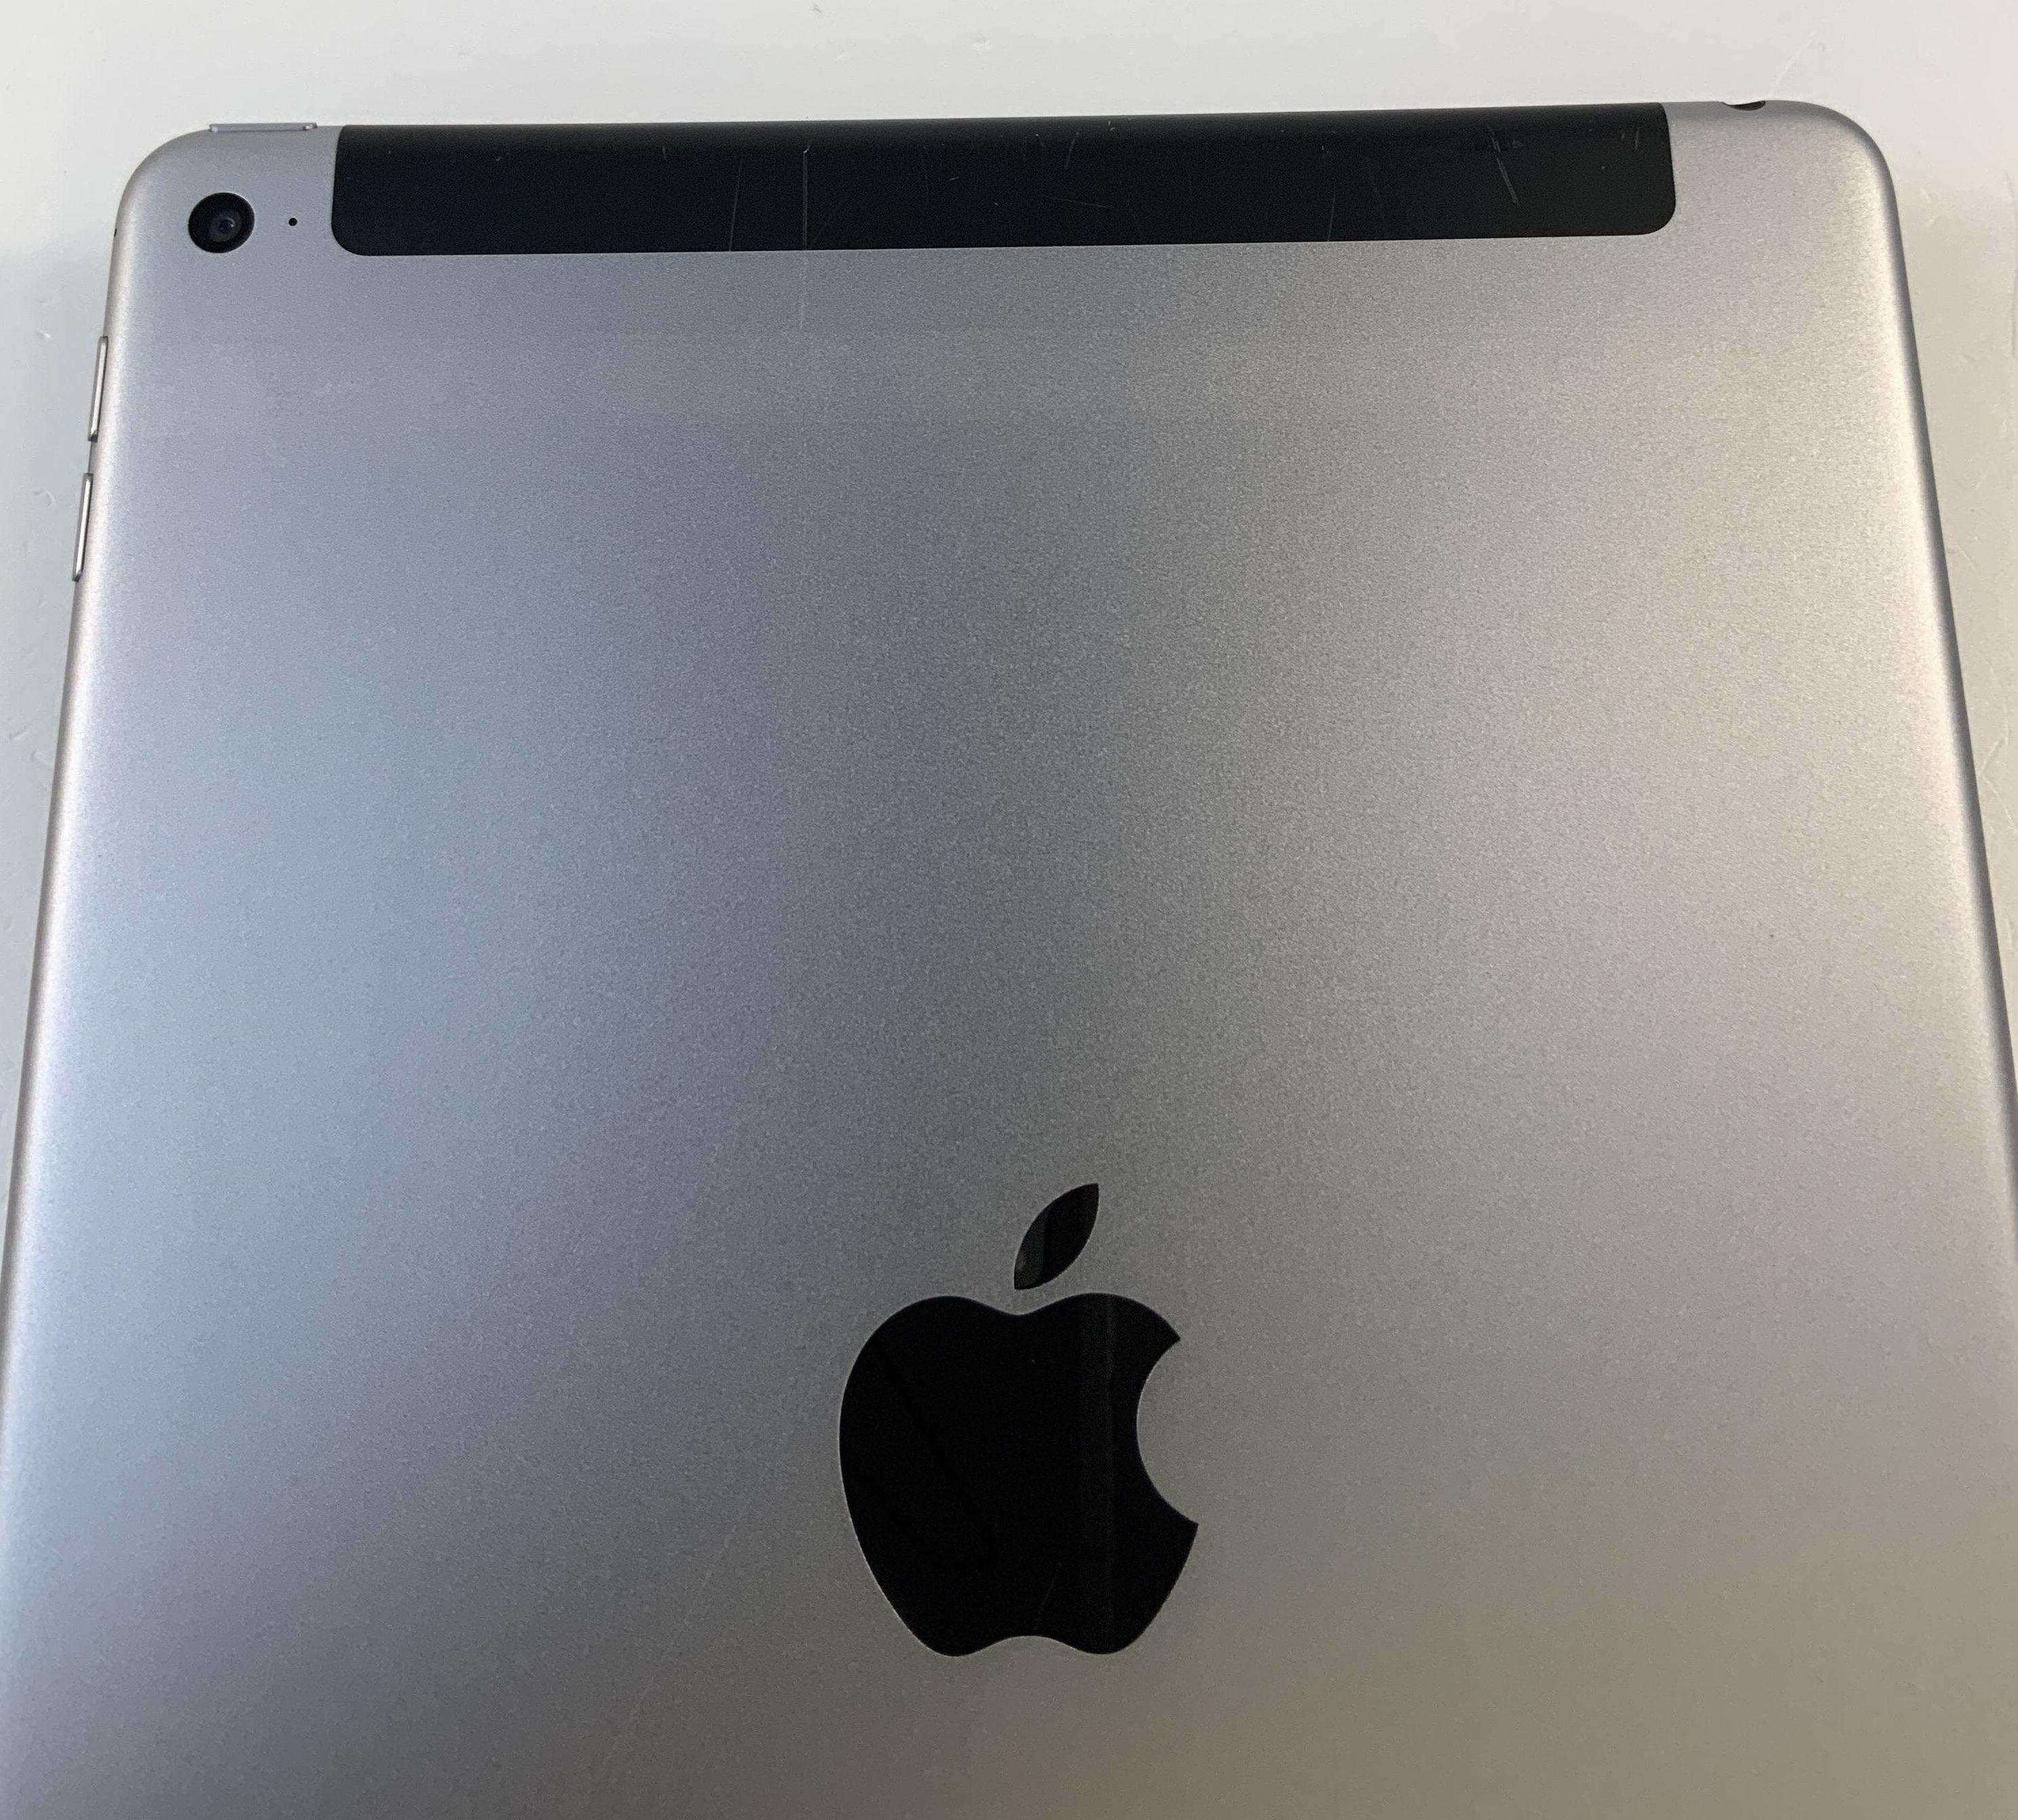 iPad Air 2 Wi-Fi + Cellular 128GB, 128GB, Space Gray, bild 4